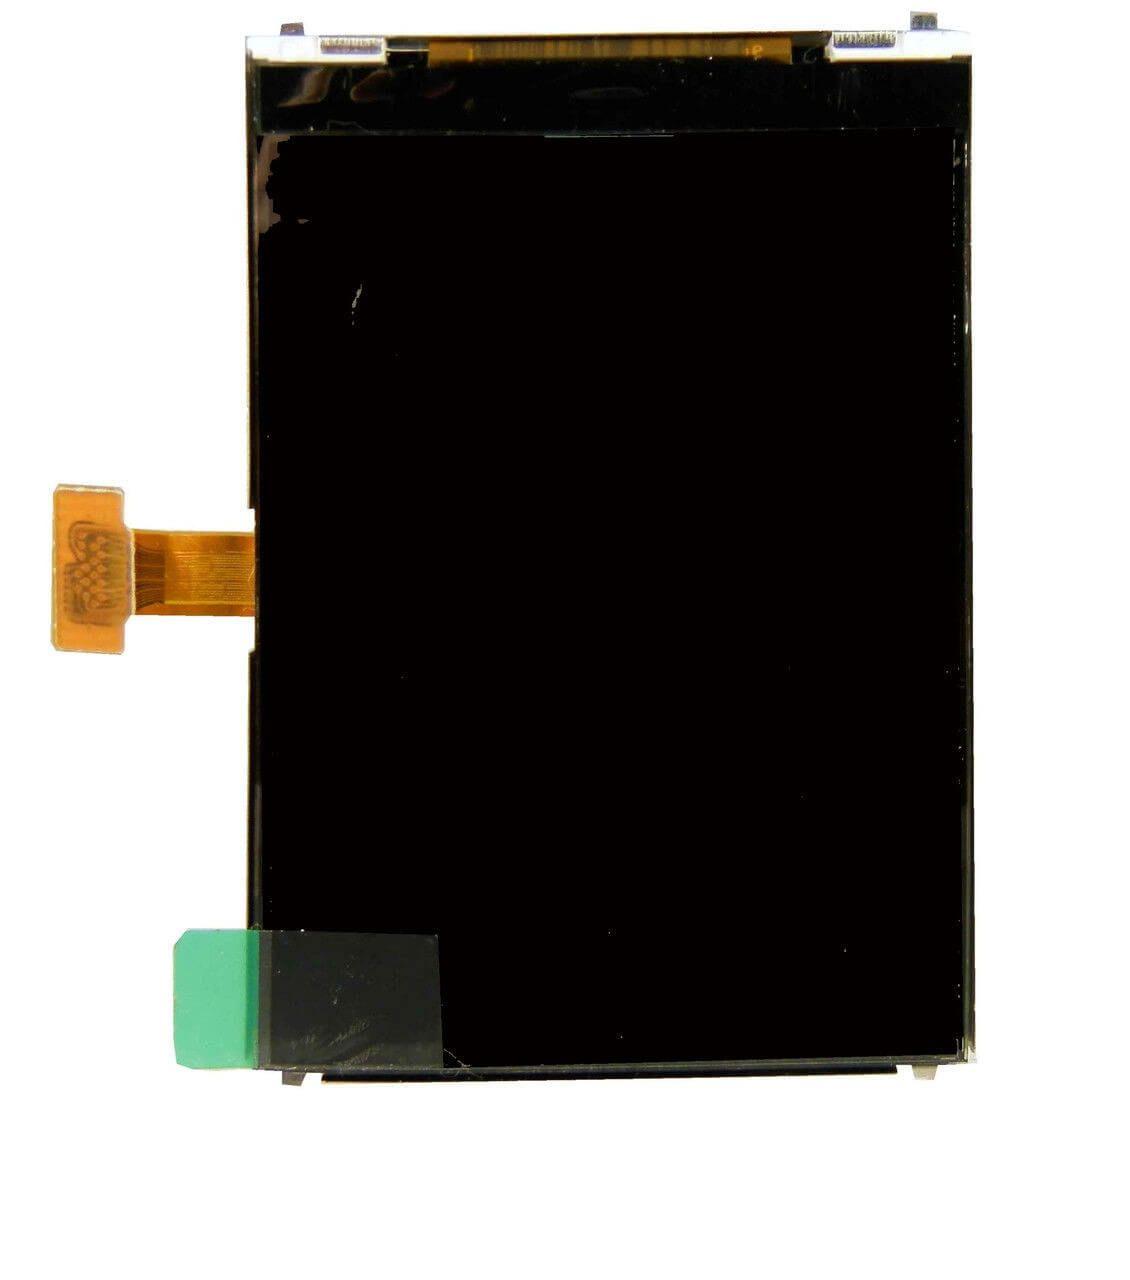 Картинка Дисплей Samsung C3300 от магазина NBS Parts